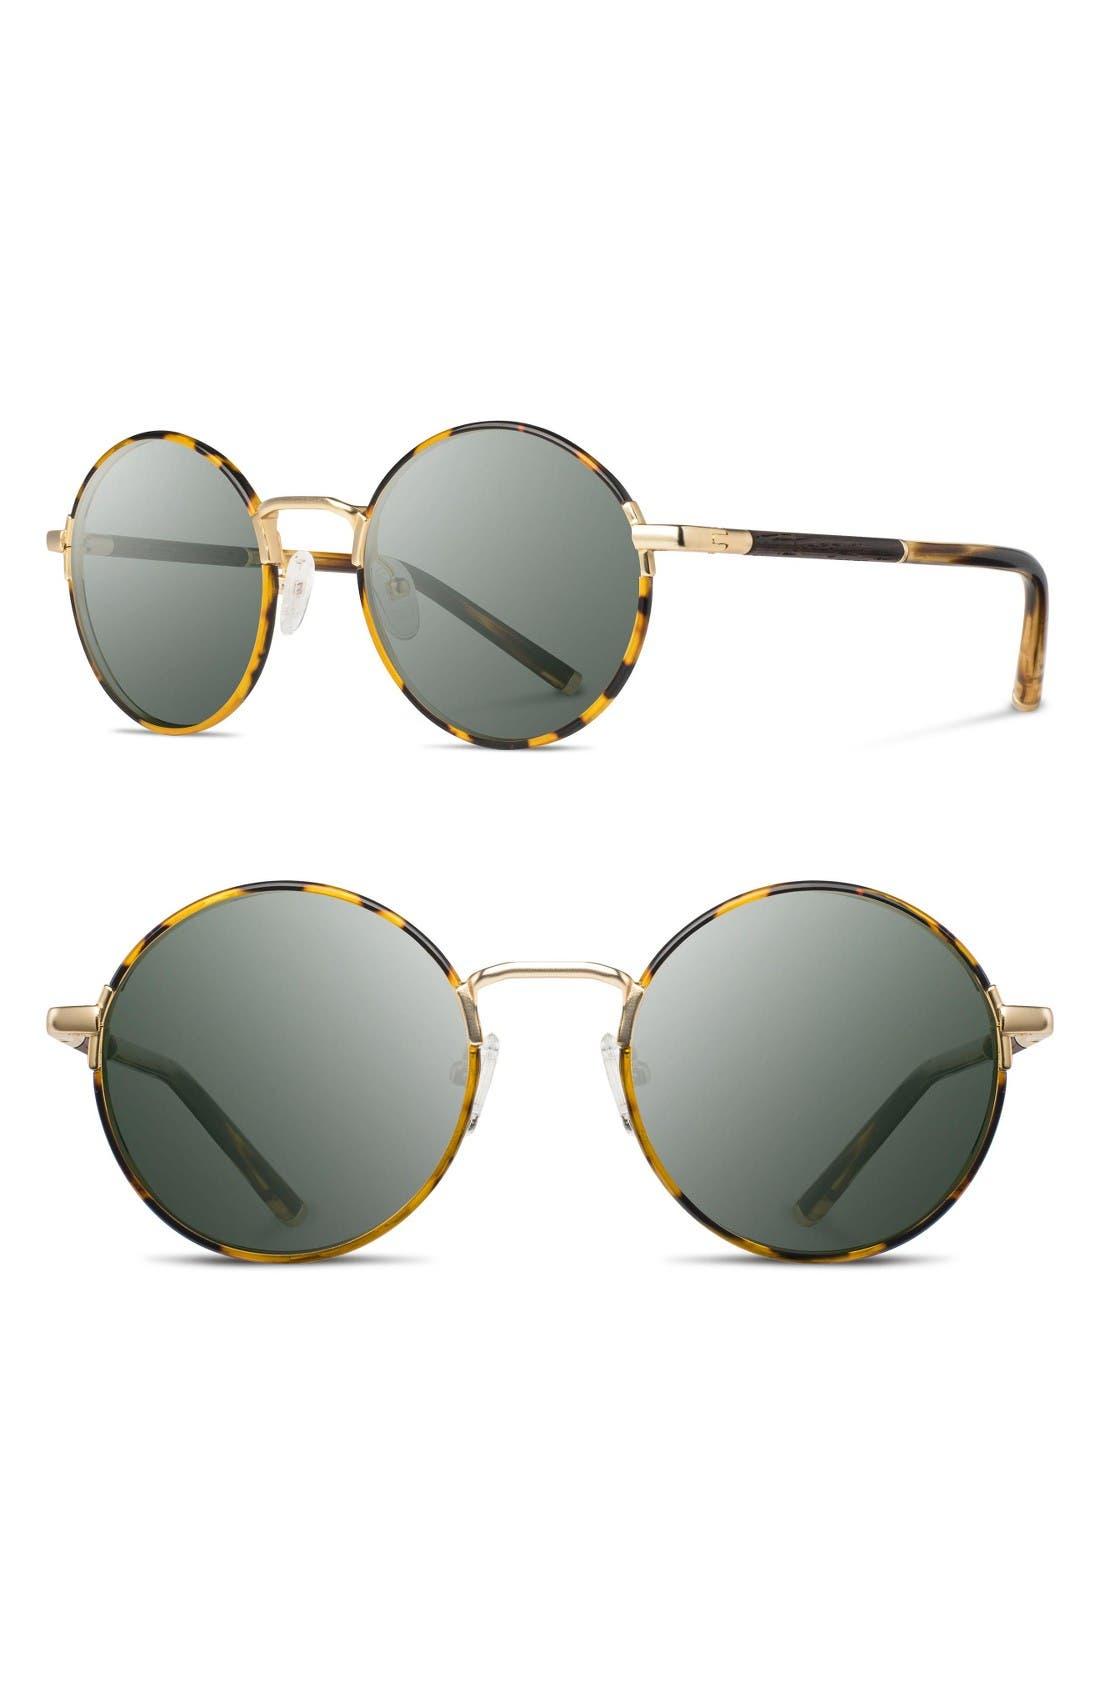 Main Image - Shwood Hawthorne 50mm Acetate Sunglasses